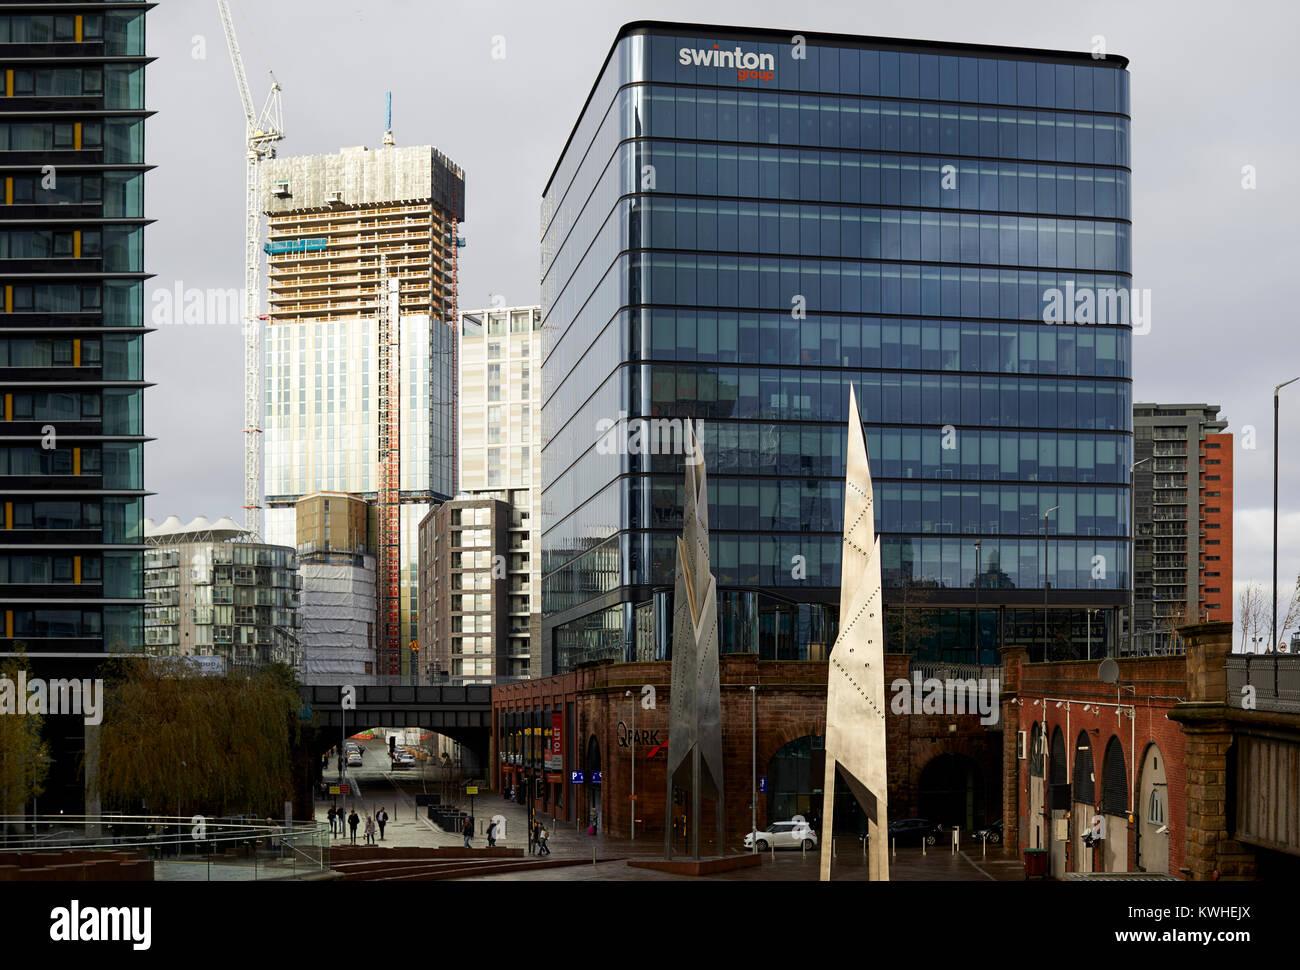 British insurance company stock photos british insurance company stock images alamy - Axa insurance uk head office ...